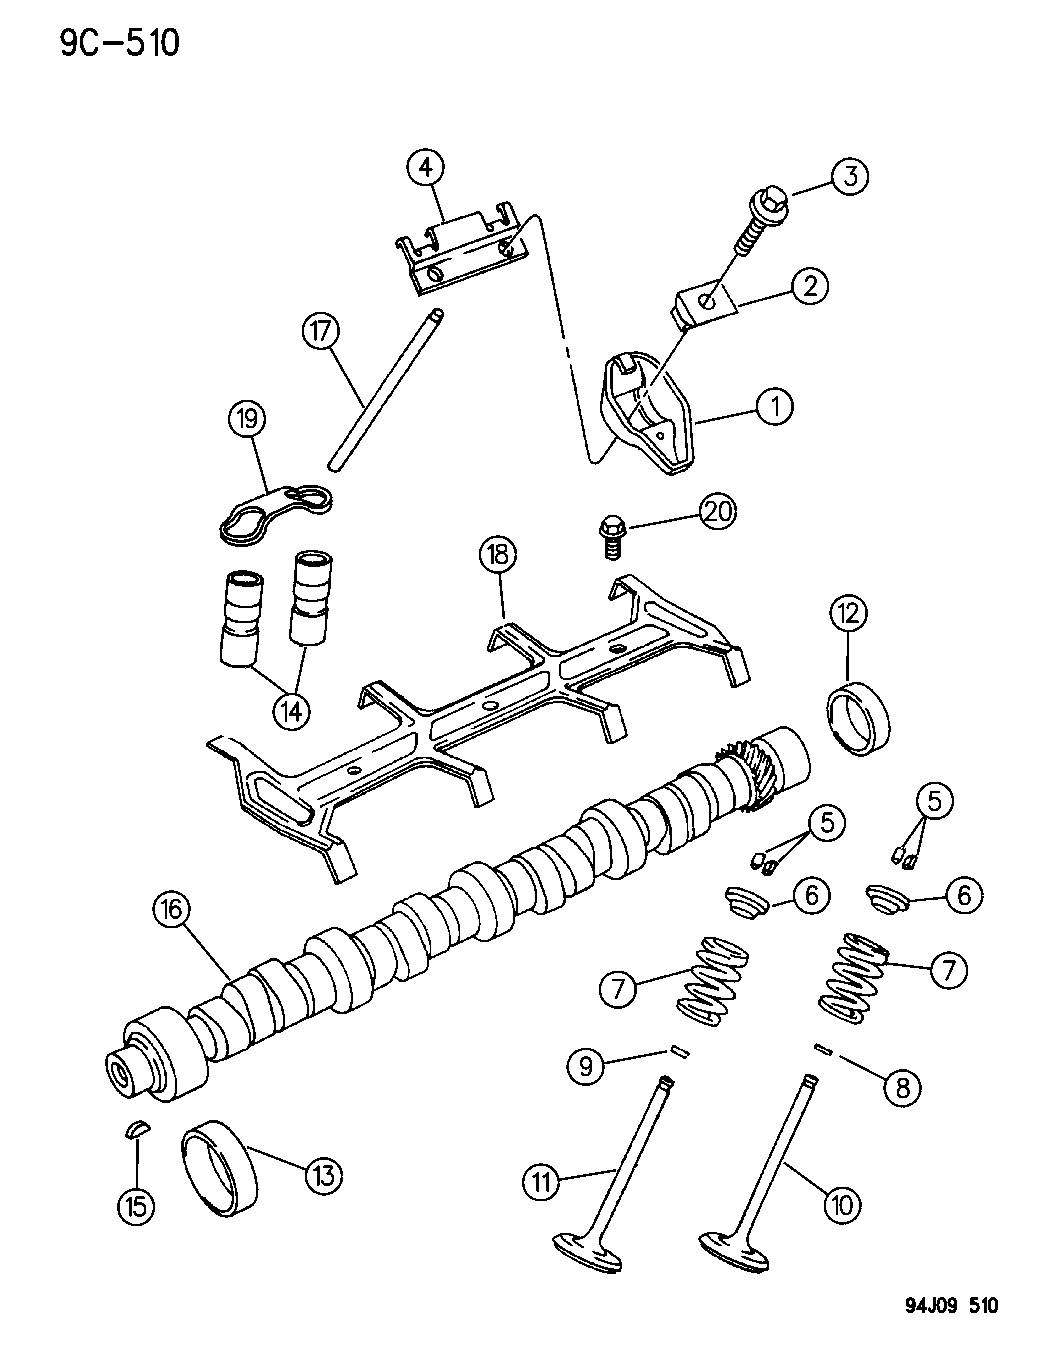 4 0 Jeep Engine Camshaft Diagram Wiring Library 1996 Grand Cherokee Valves Thumbnail 1